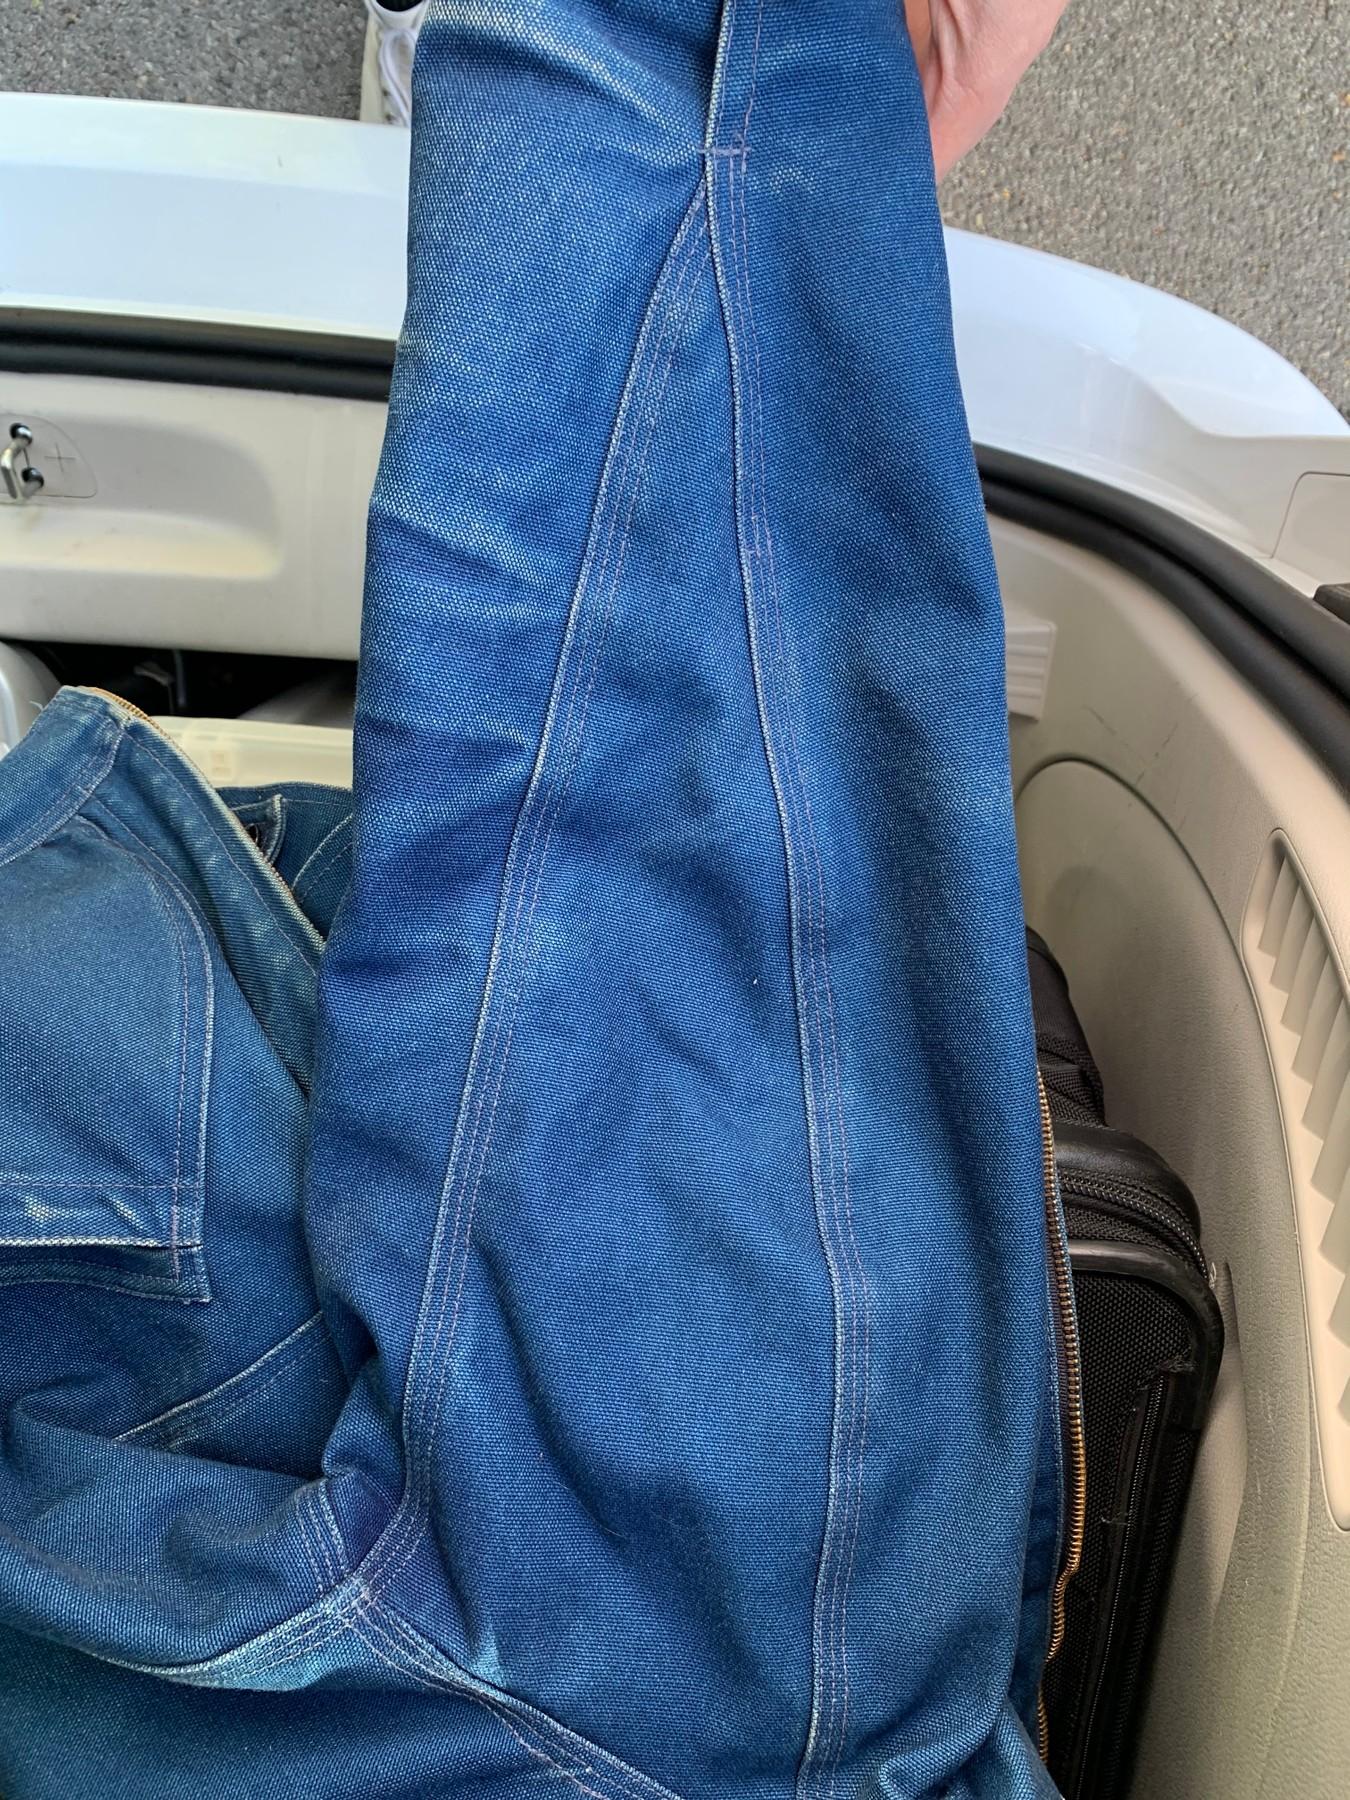 denim work jacket sleeve